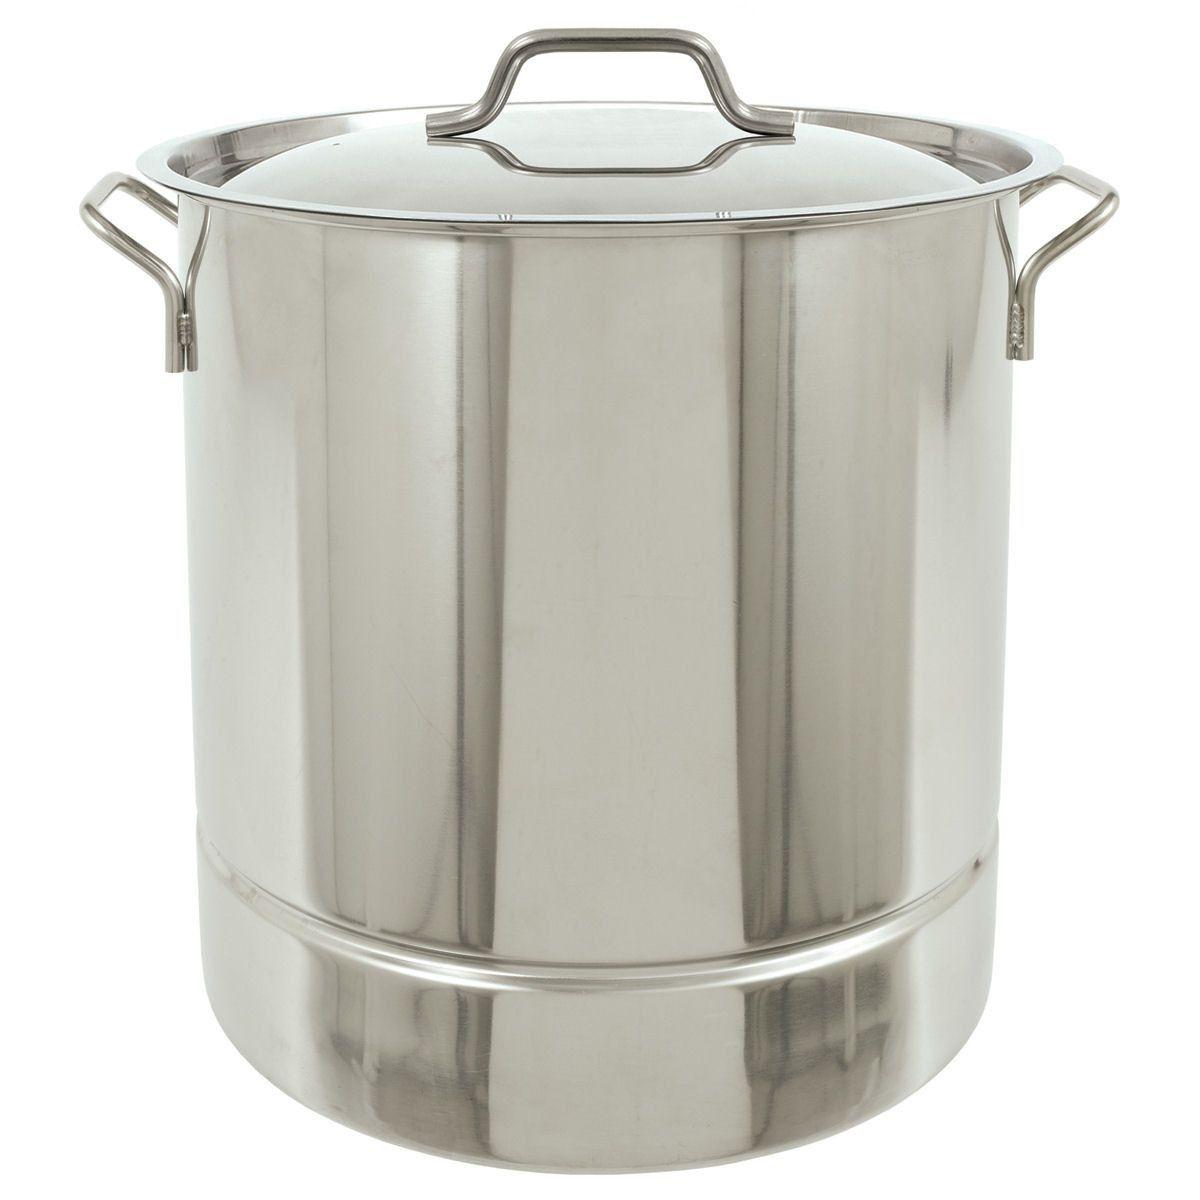 Bayou Classic 10 Gallon Bayou Classic Tri Ply Stock Pot 1310 Bayou Classic Stock Pot Steel Stock